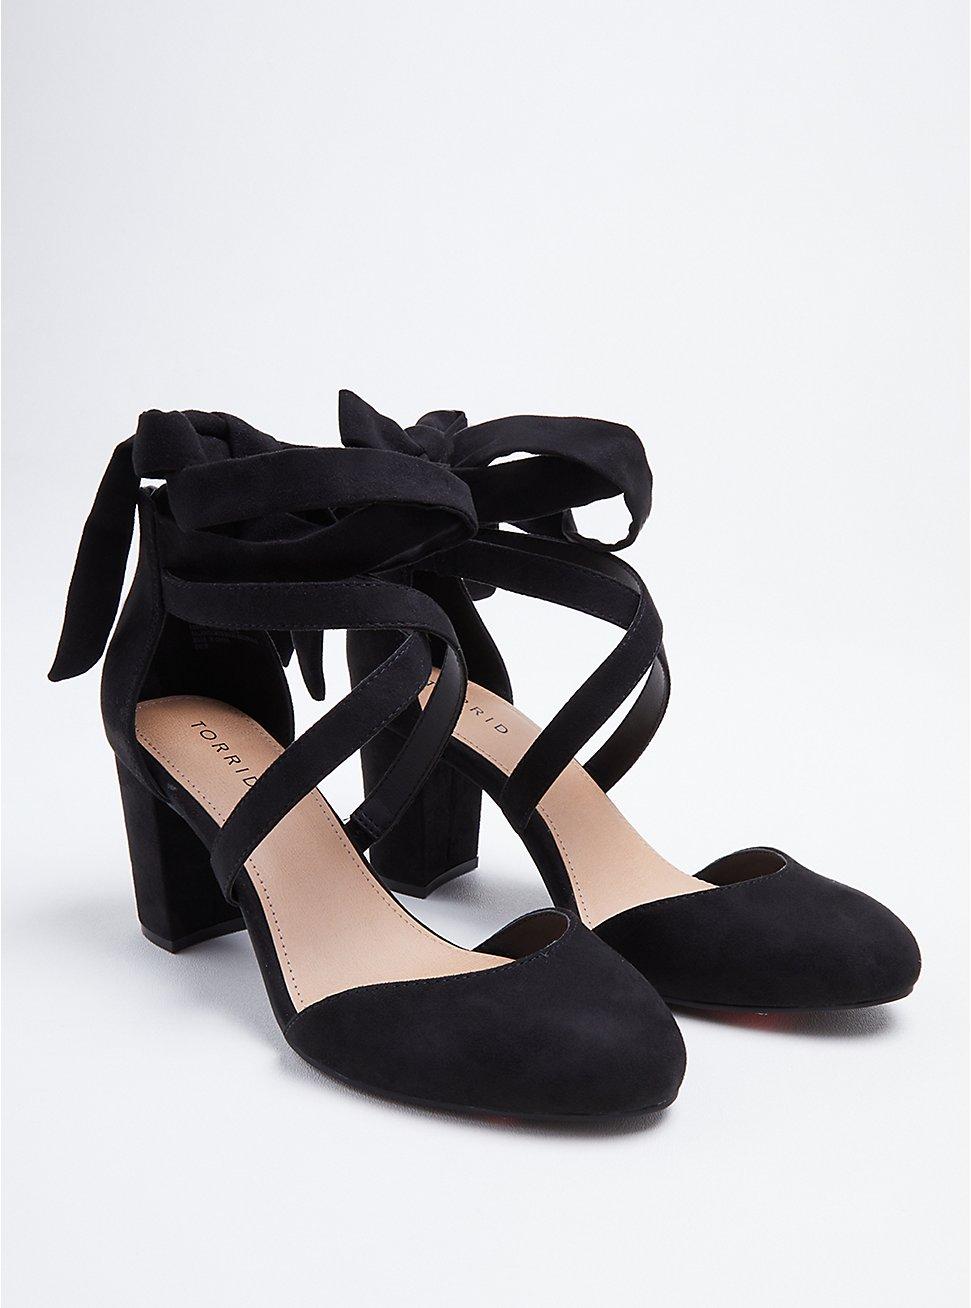 Black Faux Suede Strappy Ankle-Tie Pump (WW), BLACK, hi-res